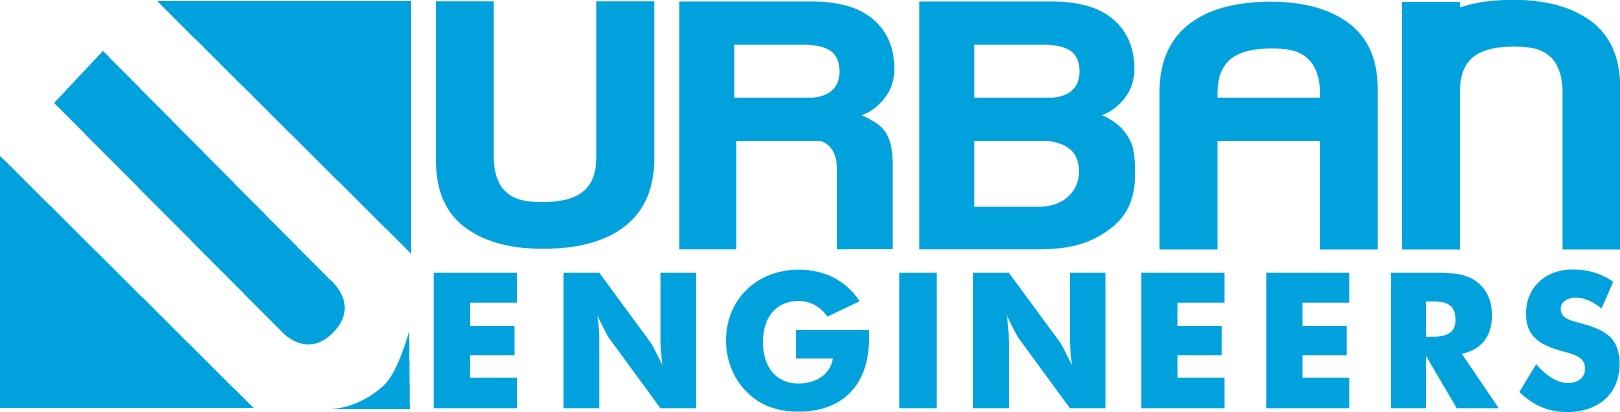 Urban Engineers, Inc. logo